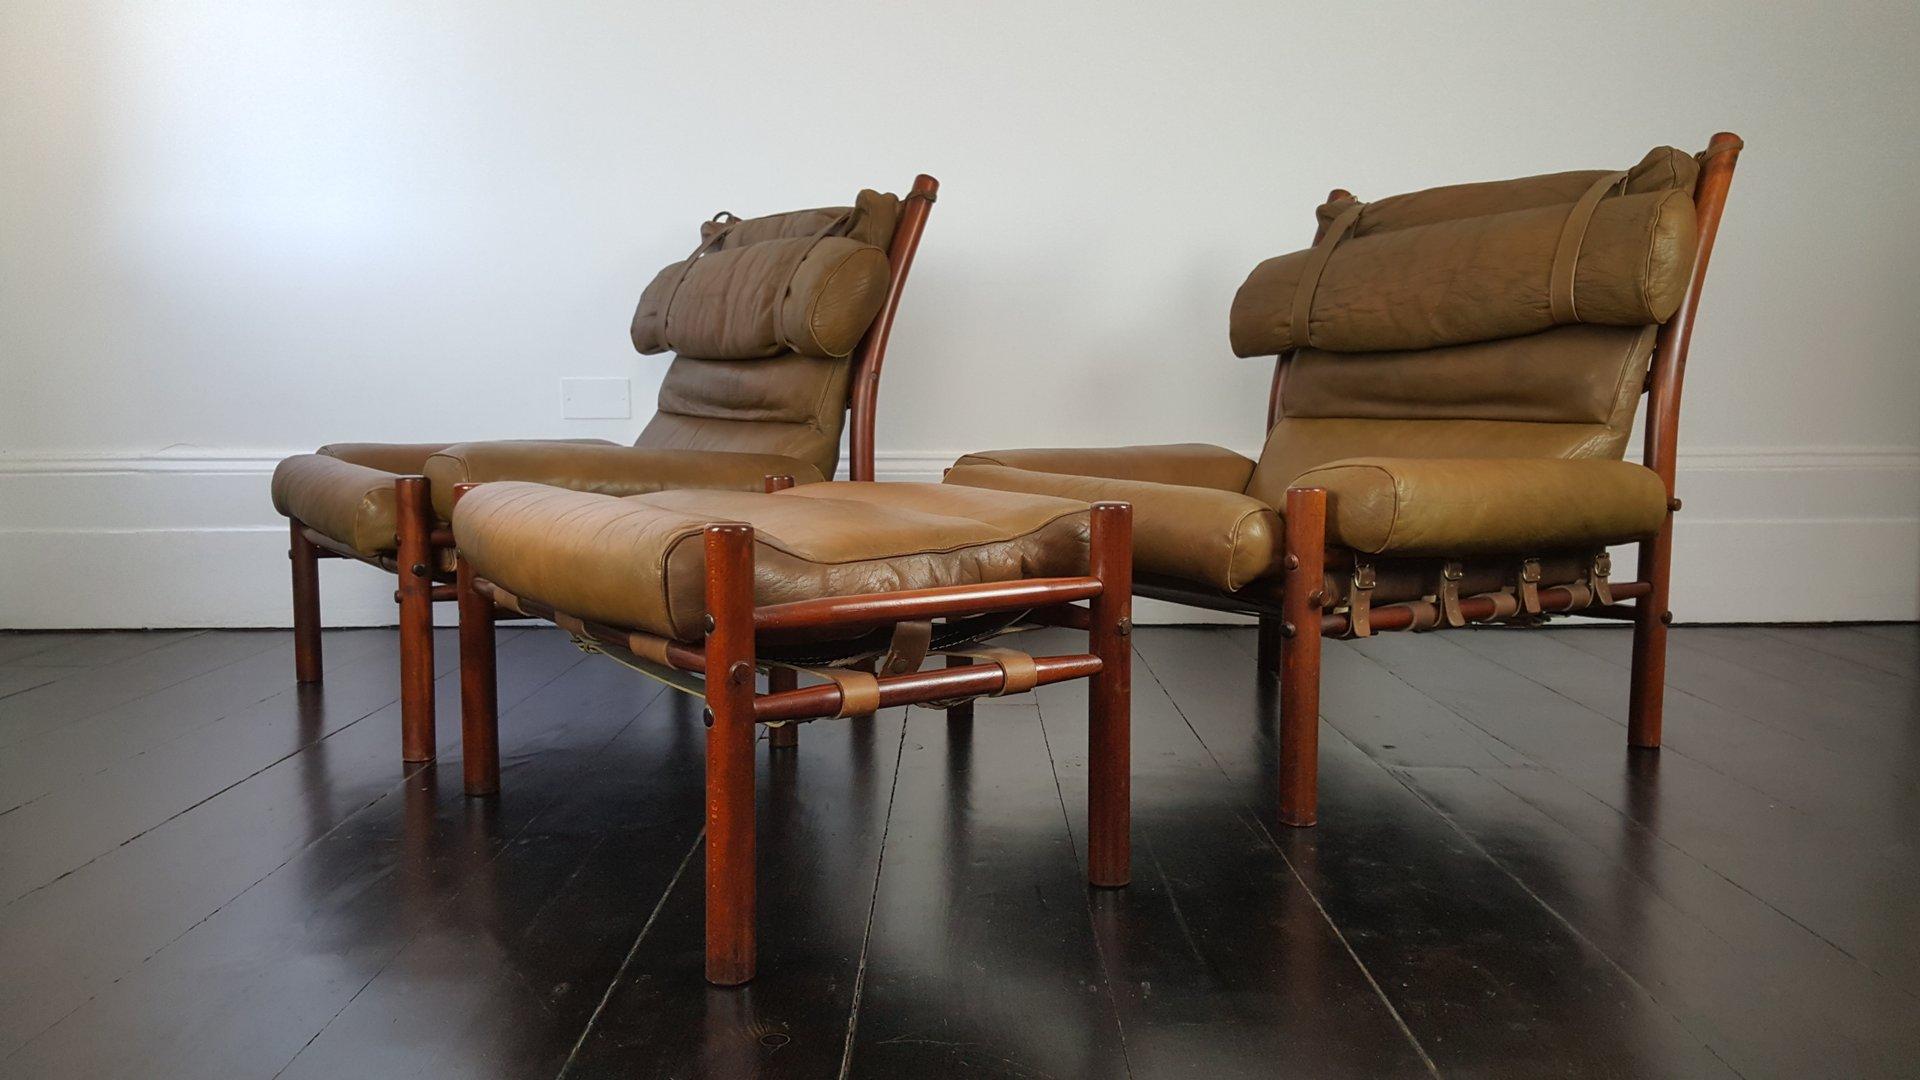 vintage inca sessel und hocker von arne norell f r norell mobler 3er set bei pamono kaufen. Black Bedroom Furniture Sets. Home Design Ideas